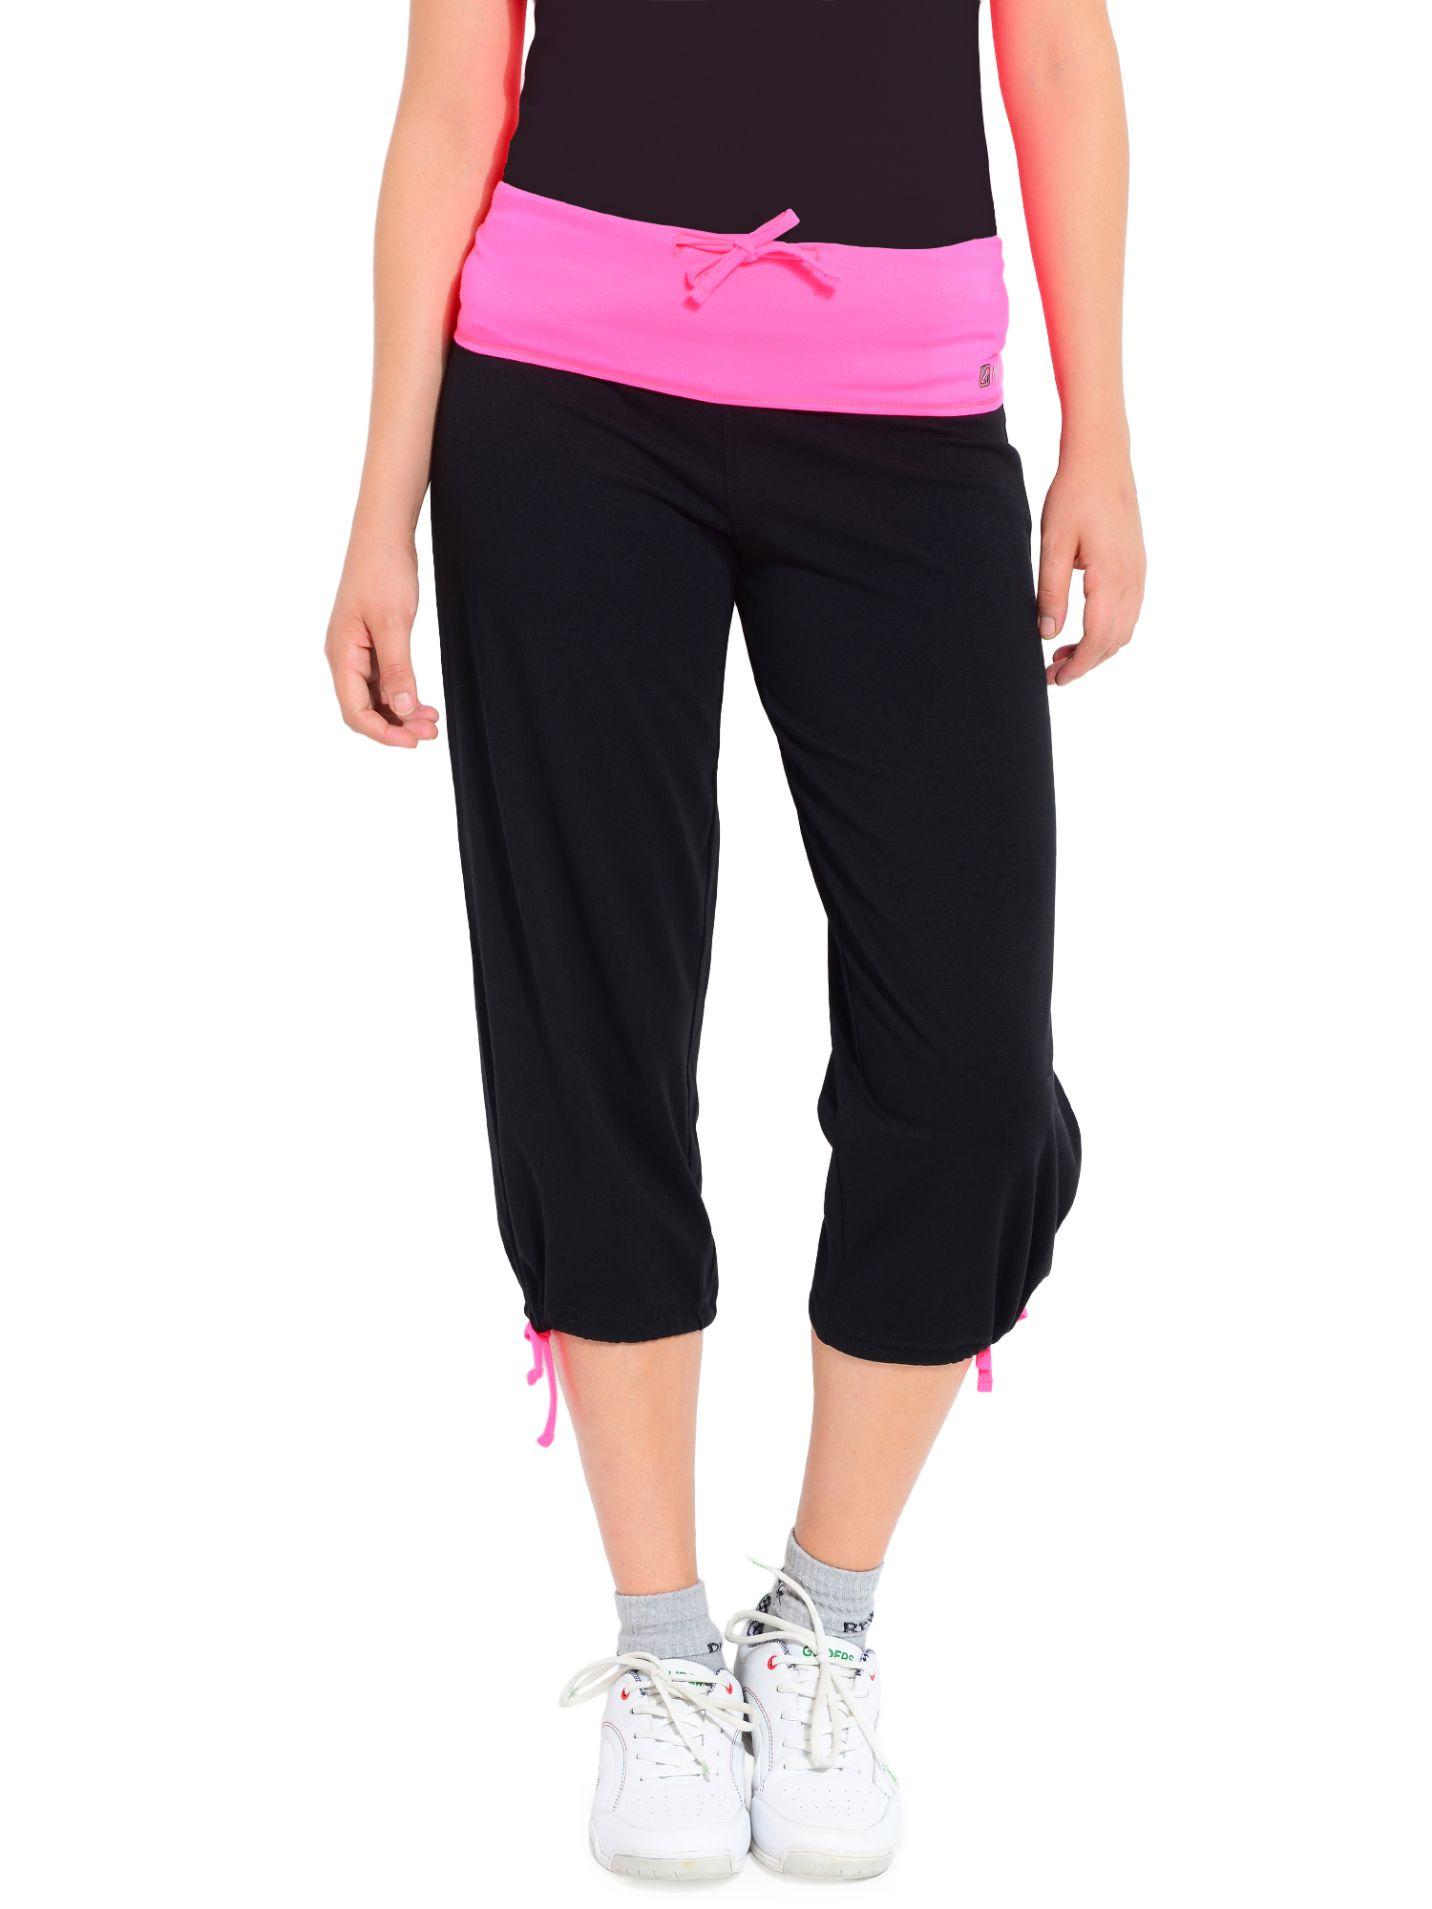 ATIVO Fluo Tie Capri Women's Pink, Black Capri